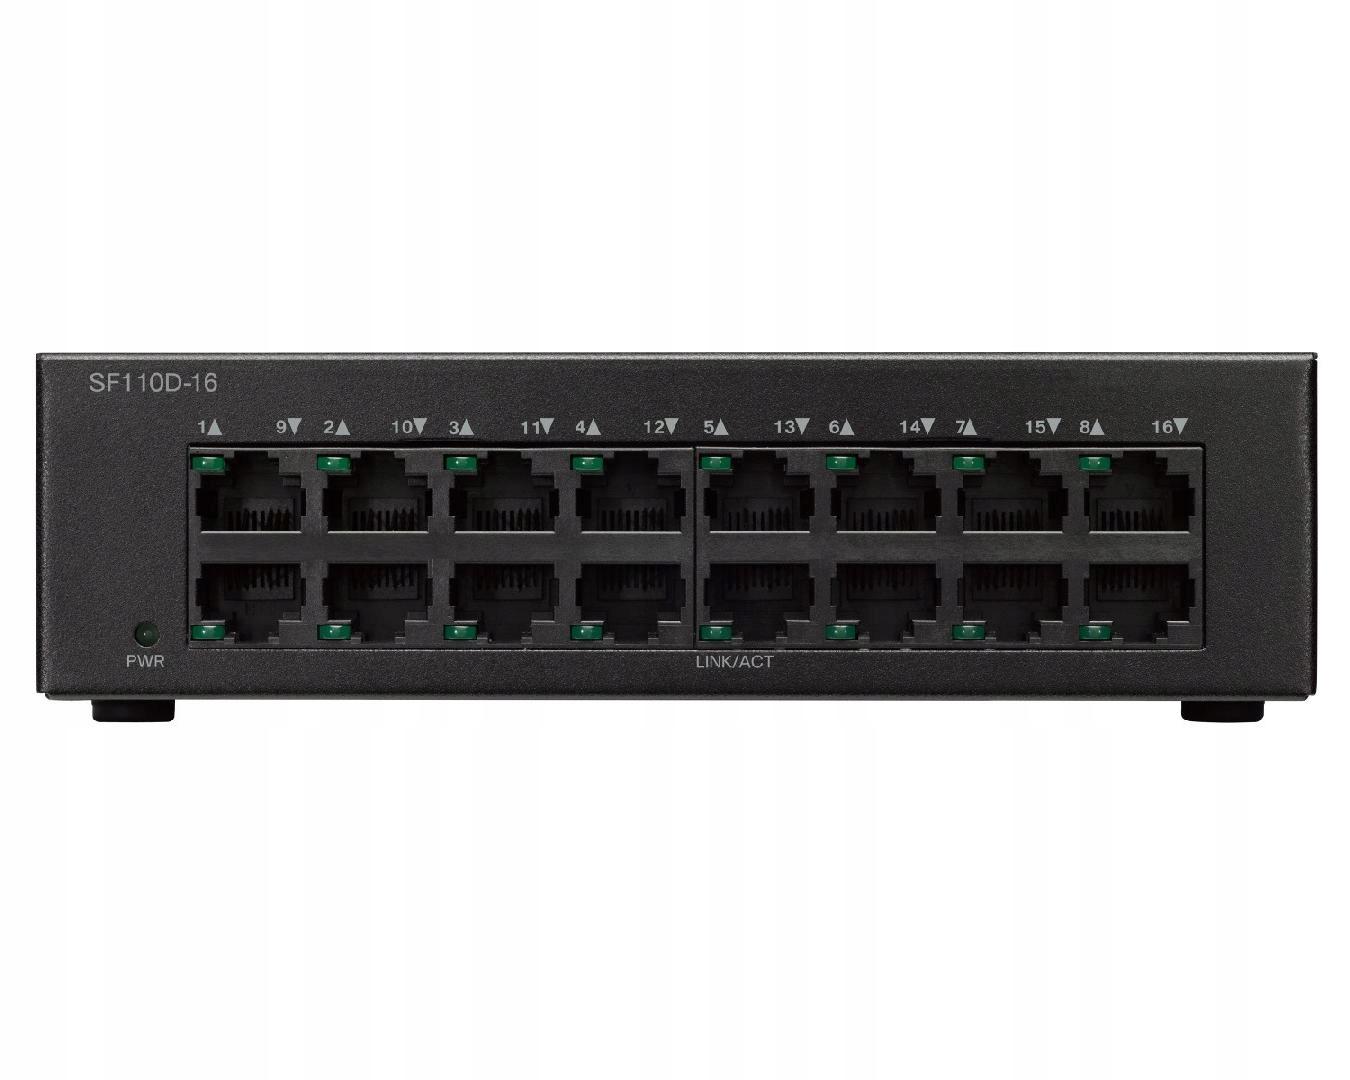 CISCO SF110D-16-EU 16x10/100 DESKTOP SWITCH